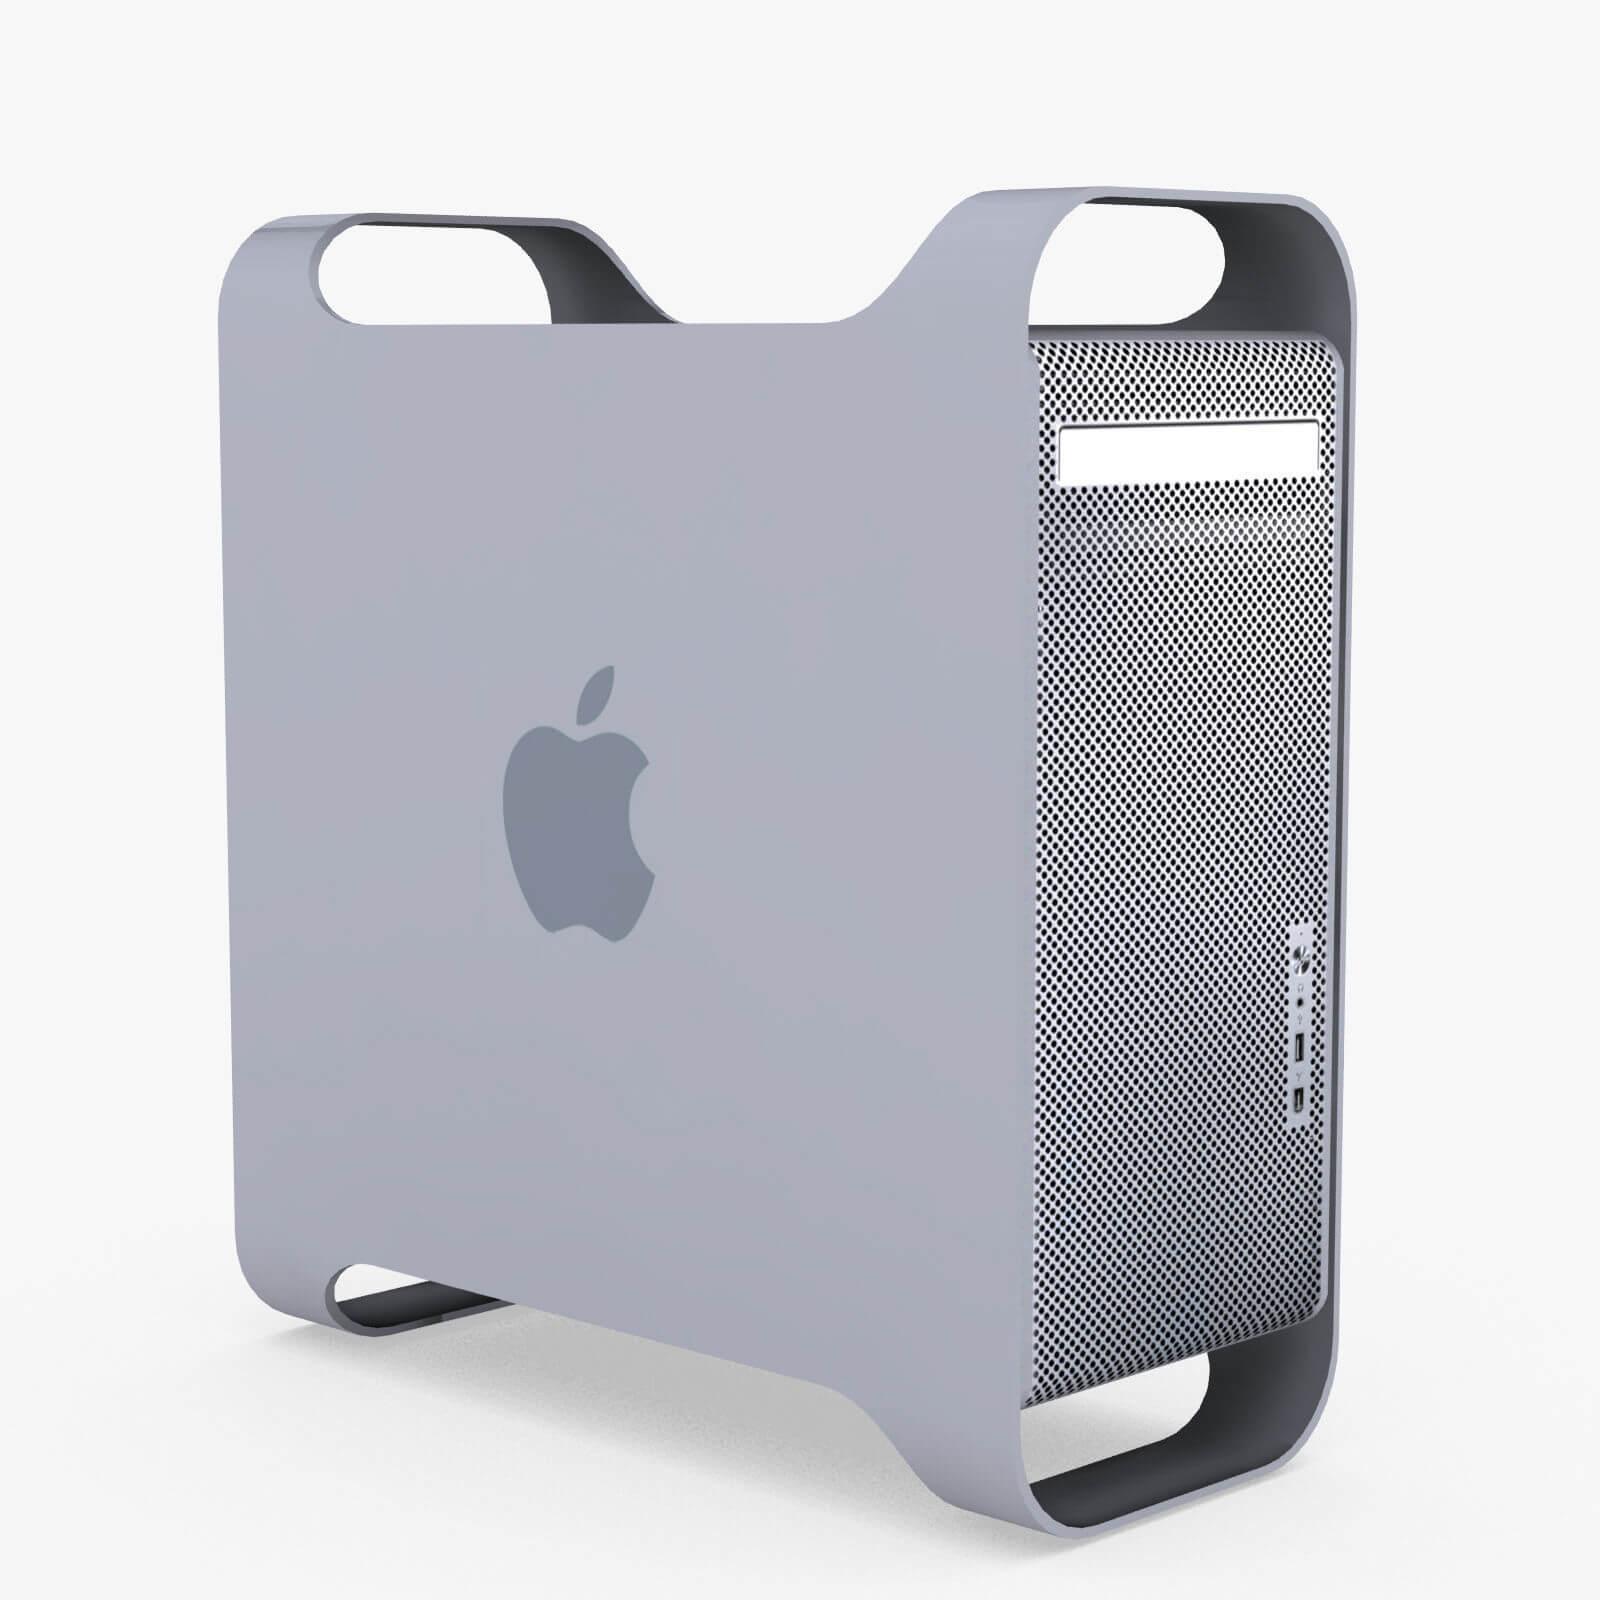 Проект Омега (PowerMac G5) — The IT-Files